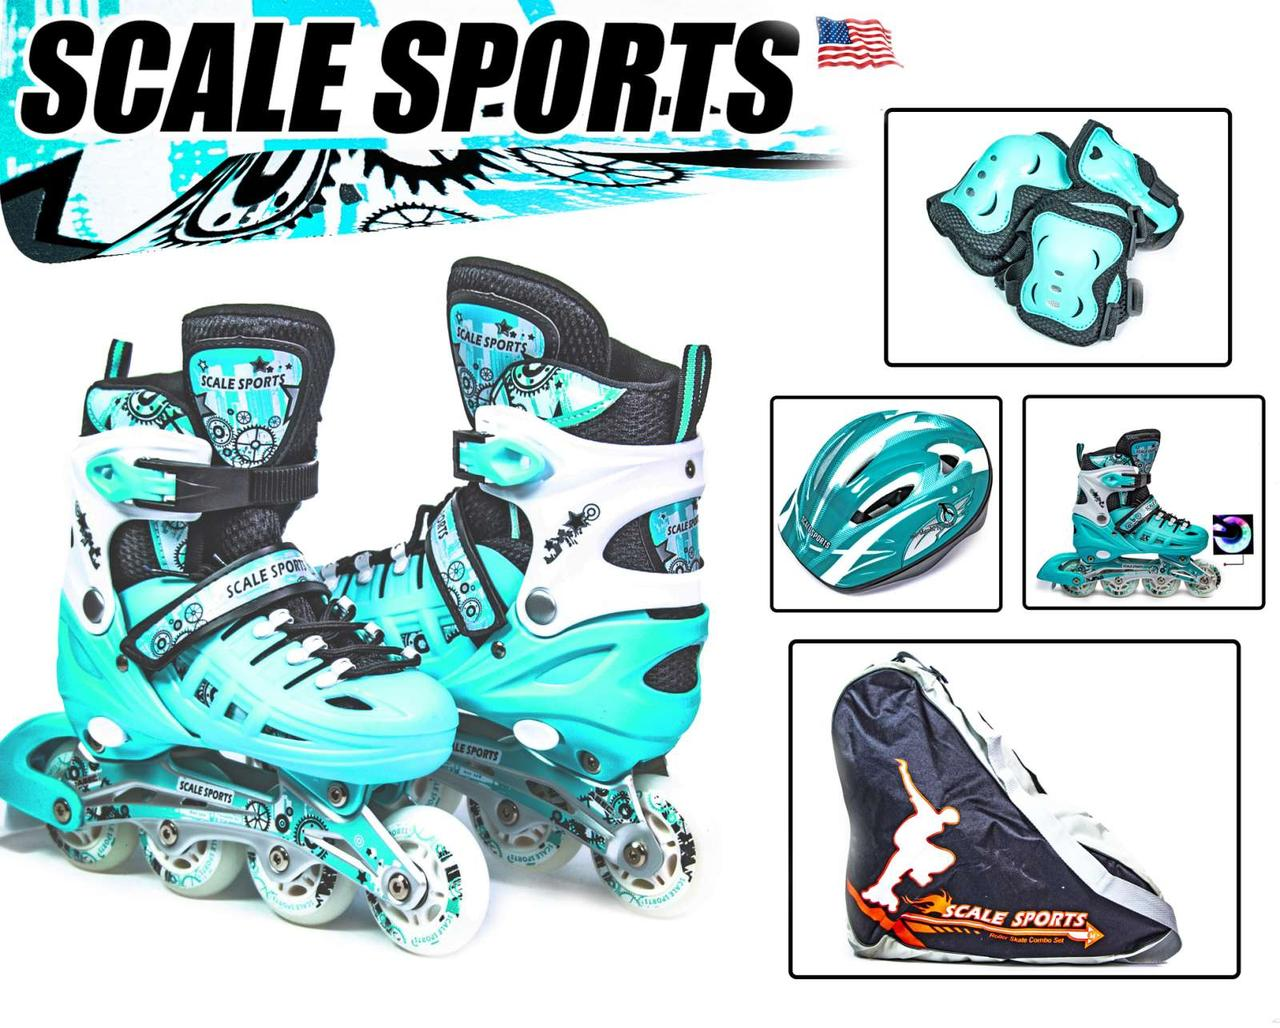 Комплект Scale Sport. Mint, размер 34-37